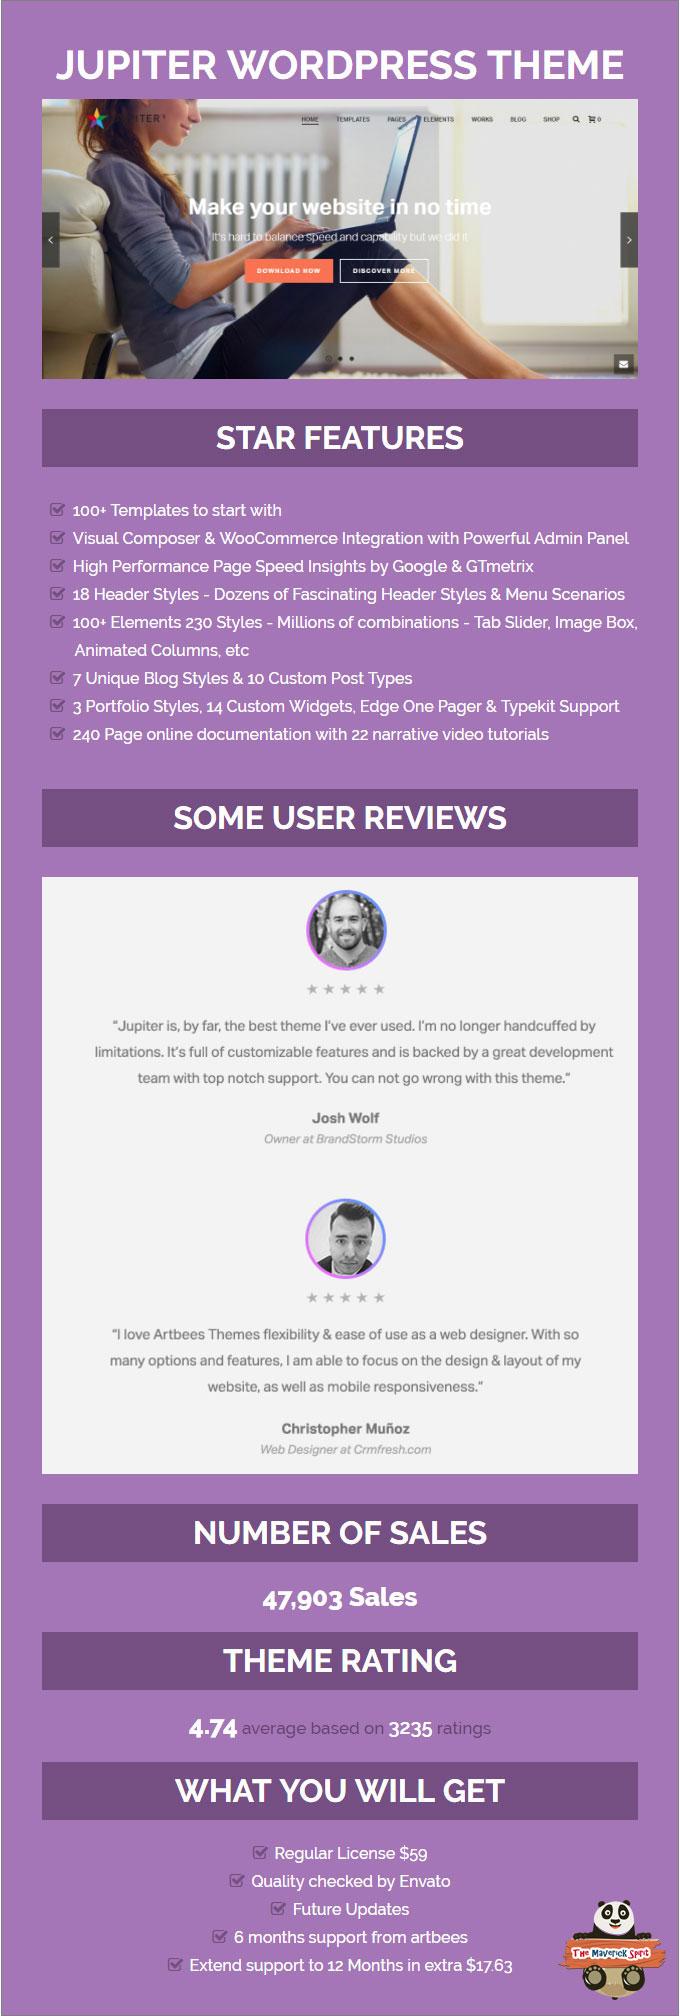 jupiter-best-one-page-wordpress-themes-the-maverick-spirit